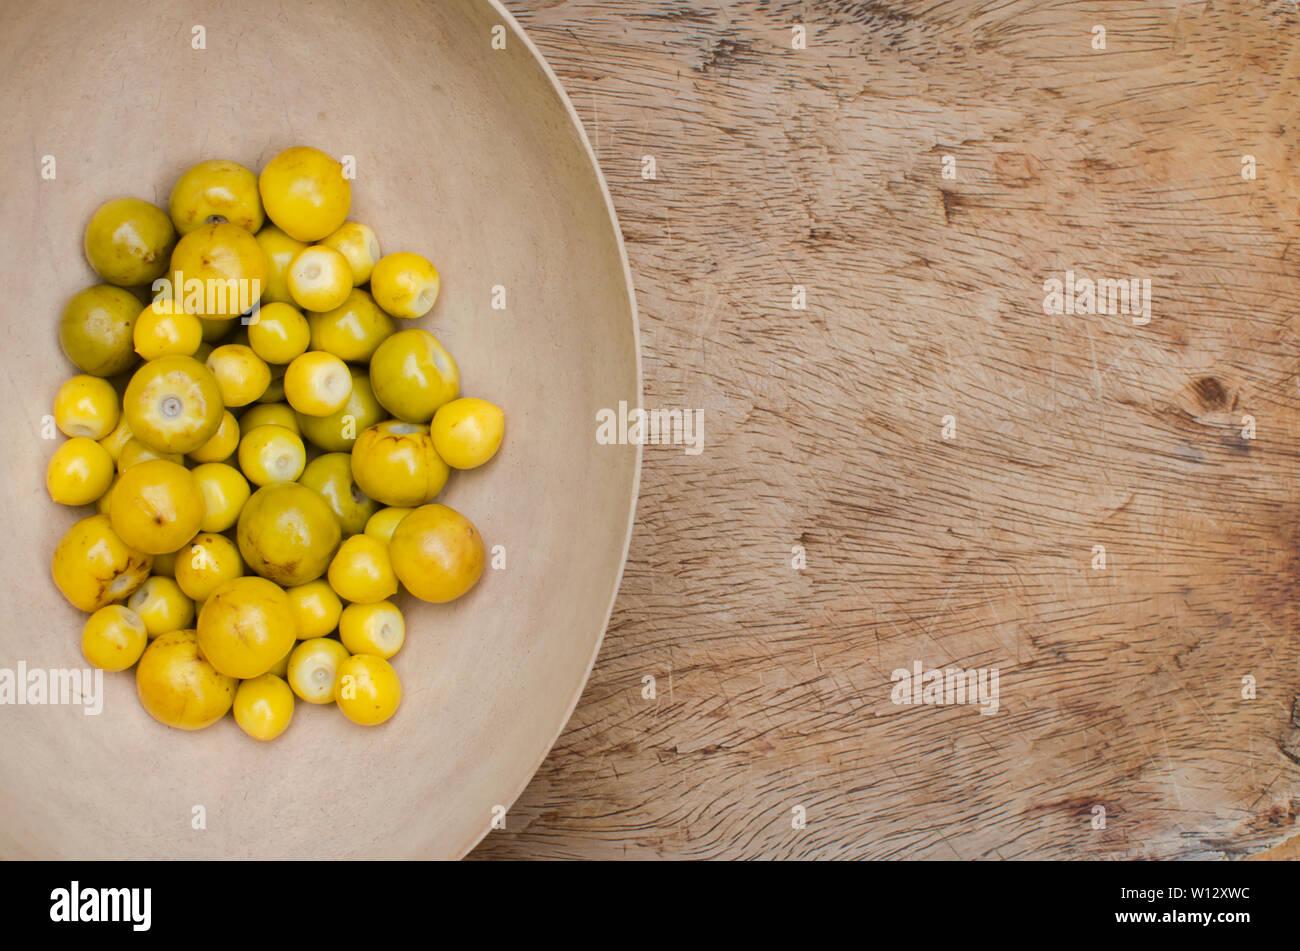 Frutos de Byrsonima crassifolia, un fruto comestible de América tropical Foto de stock